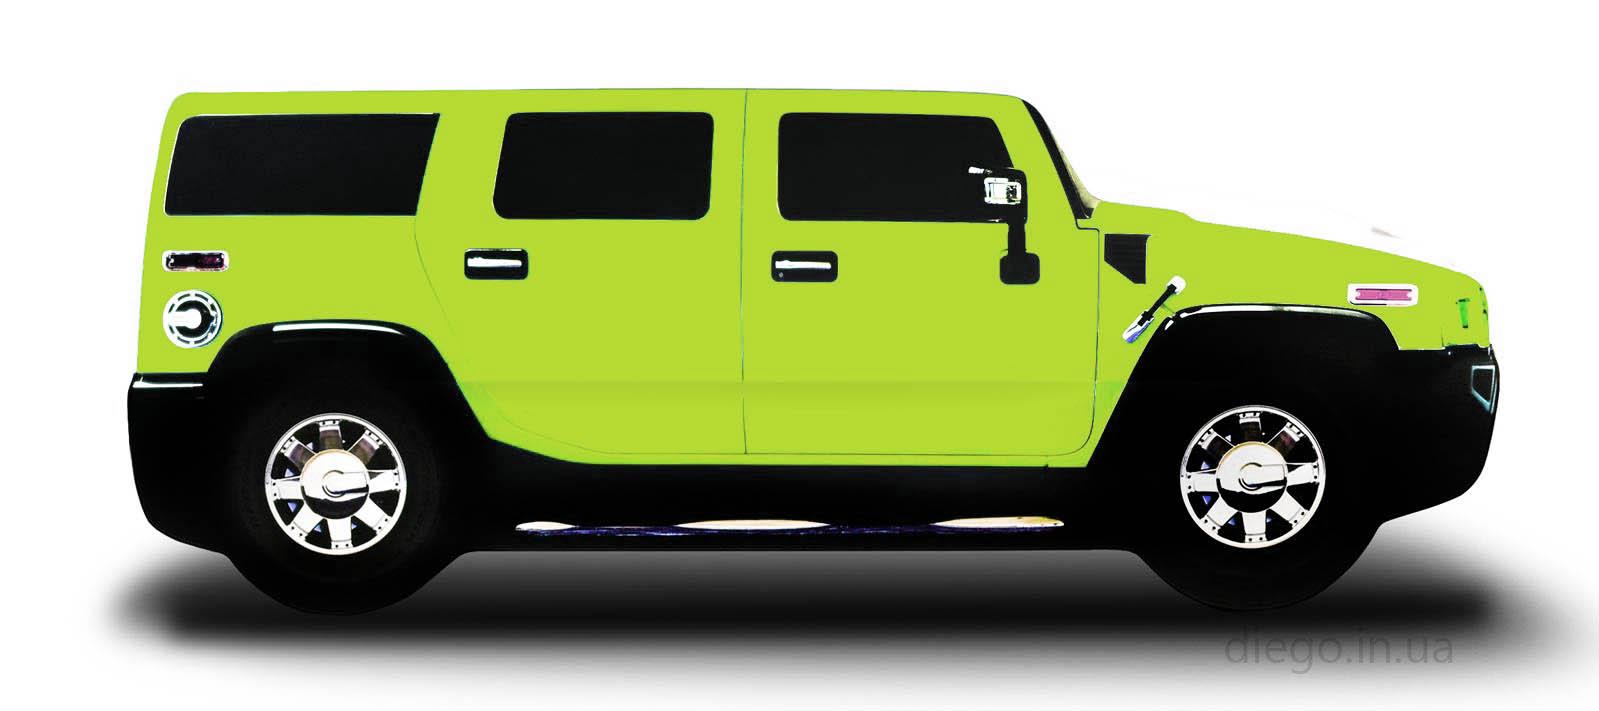 Кроватка зеленого цвета